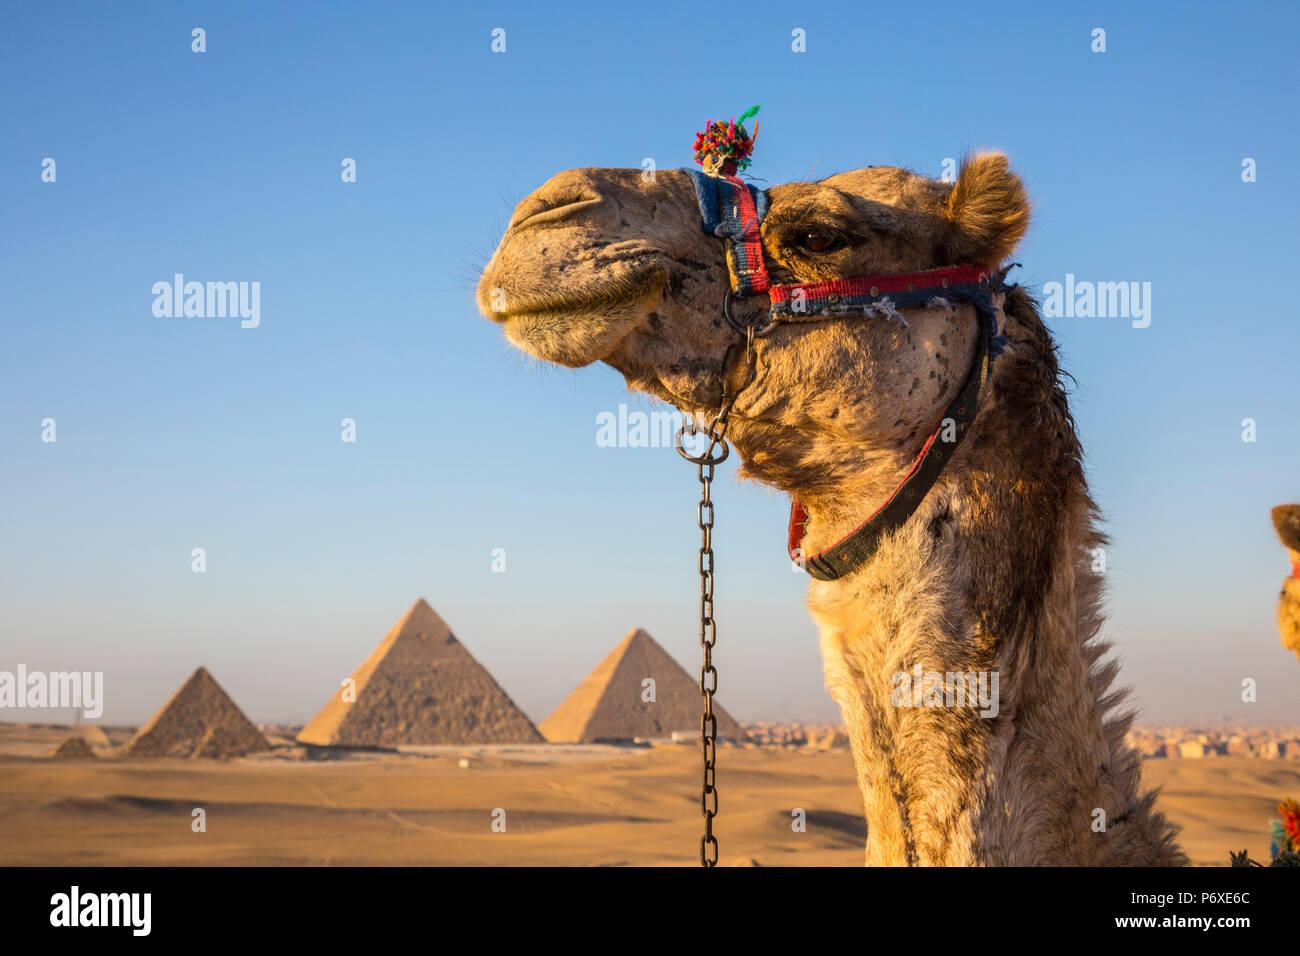 Pyramids of Giza, Giza, Cairo, Egypt - Stock Image